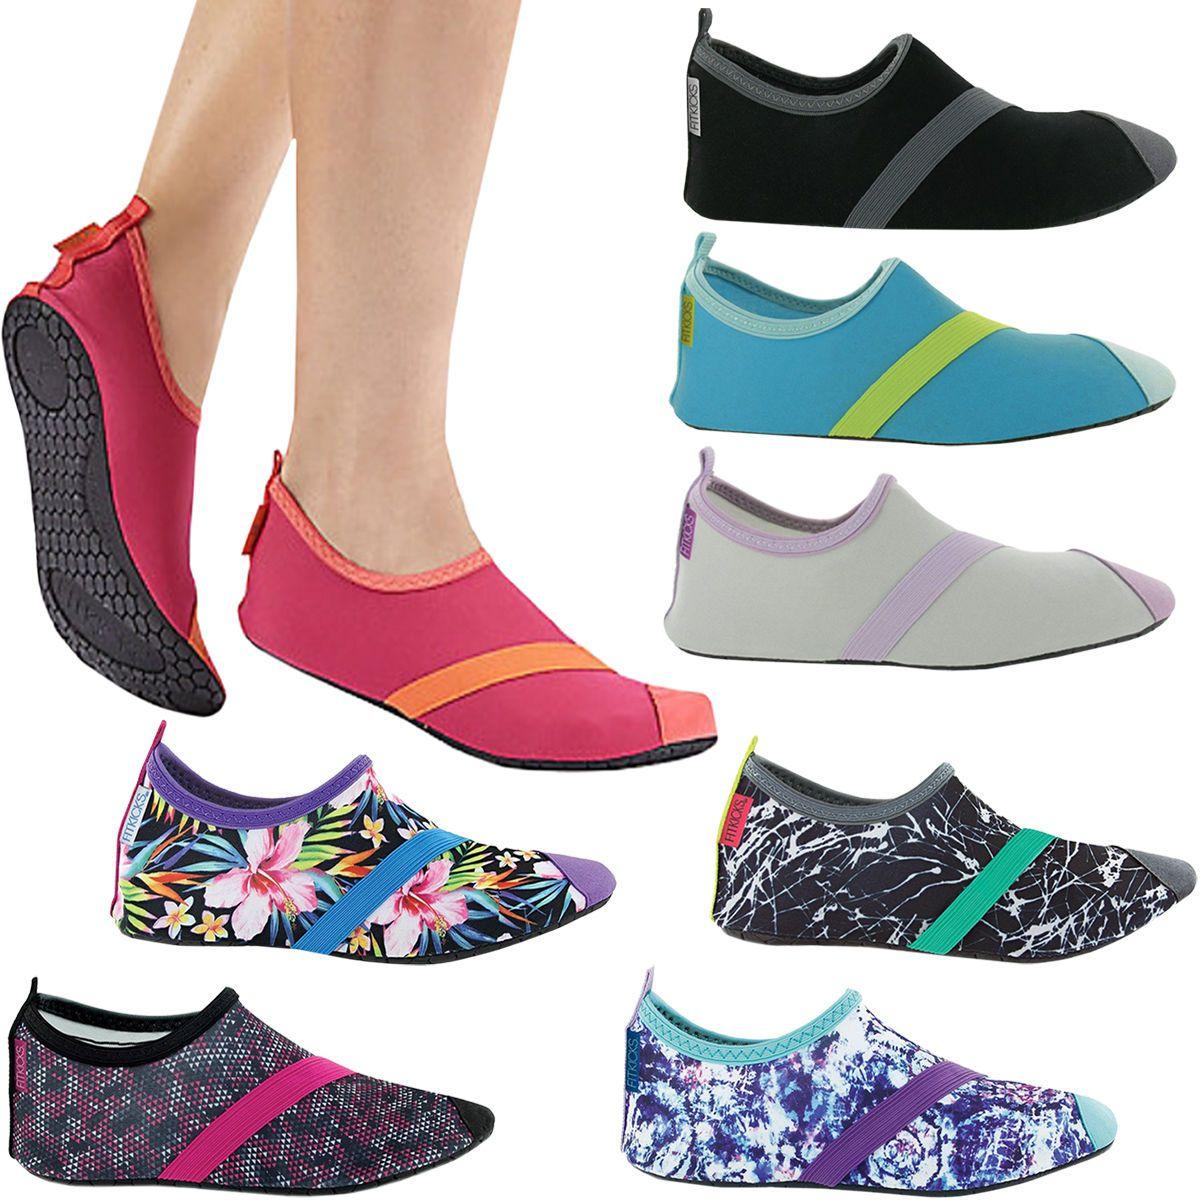 Womens Fitkicks Barefoot Yoga Ergonomic Non-Slip Sole Active Shoes